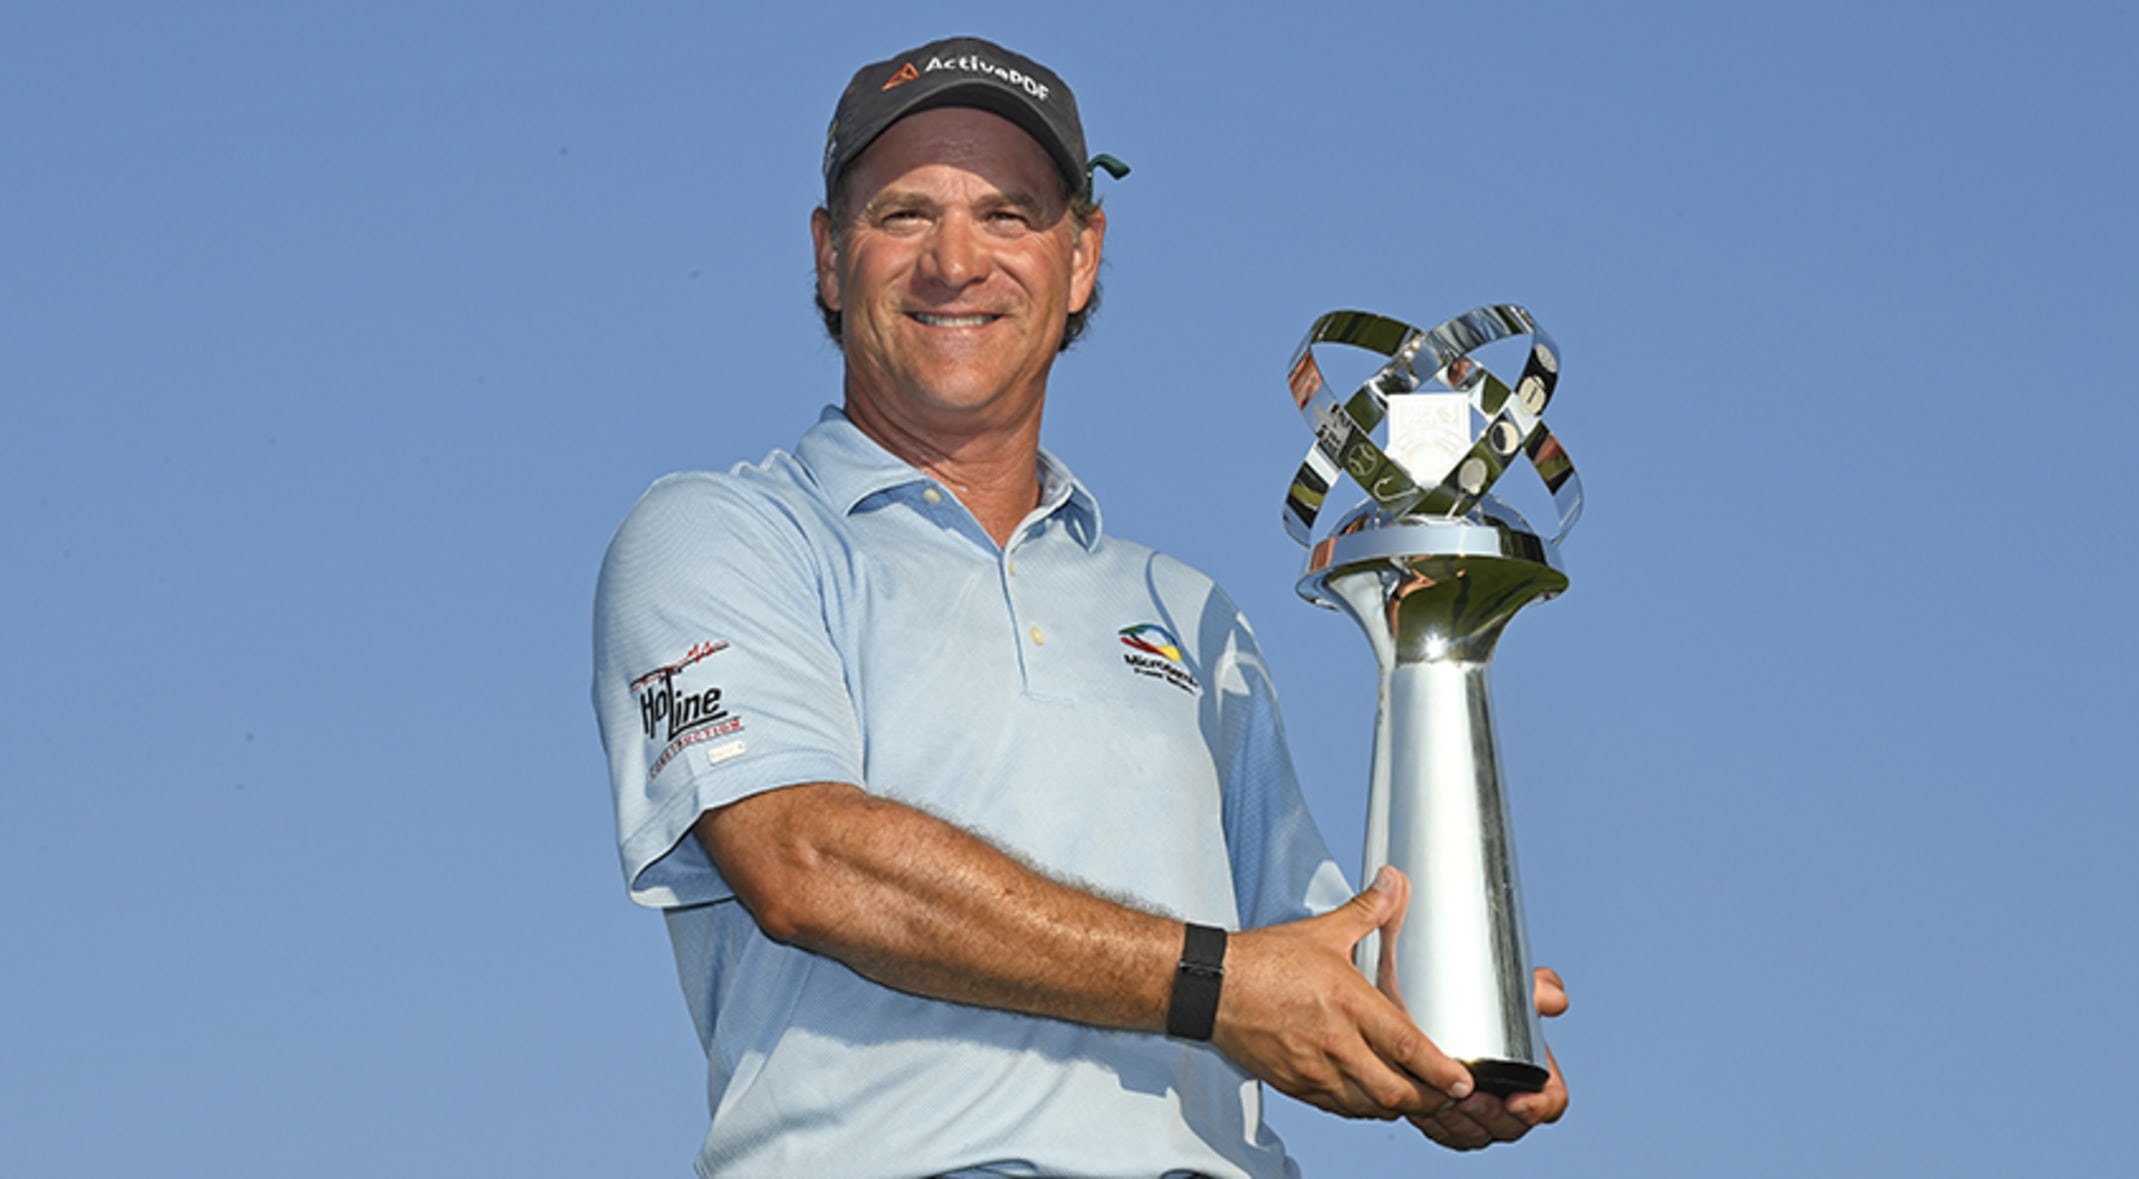 f481093d9f6b Scott McCarron won for the third time this season on PGA TOUR Champions.  (Chris